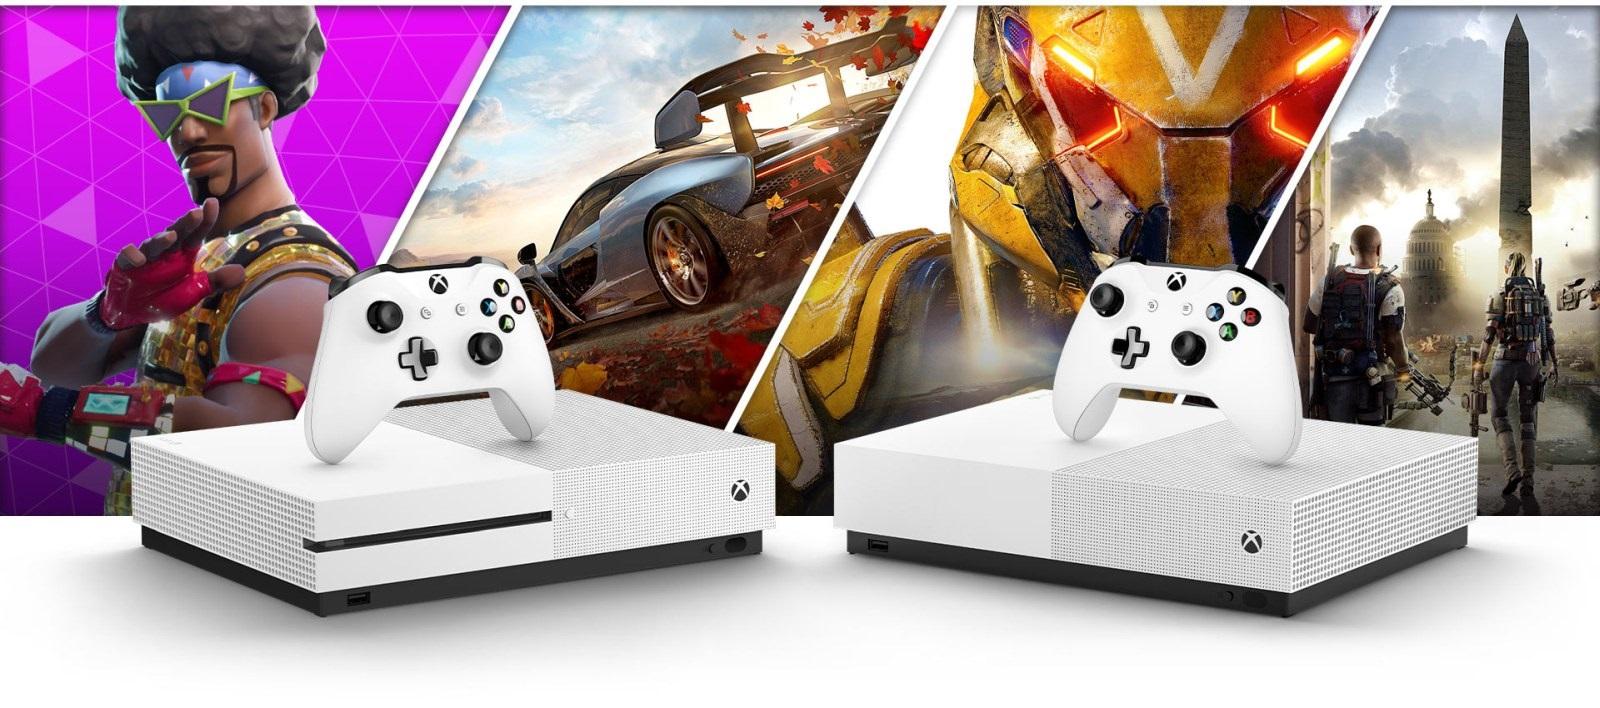 Xbox One S All-Digital Edition; screenshot: srovnání